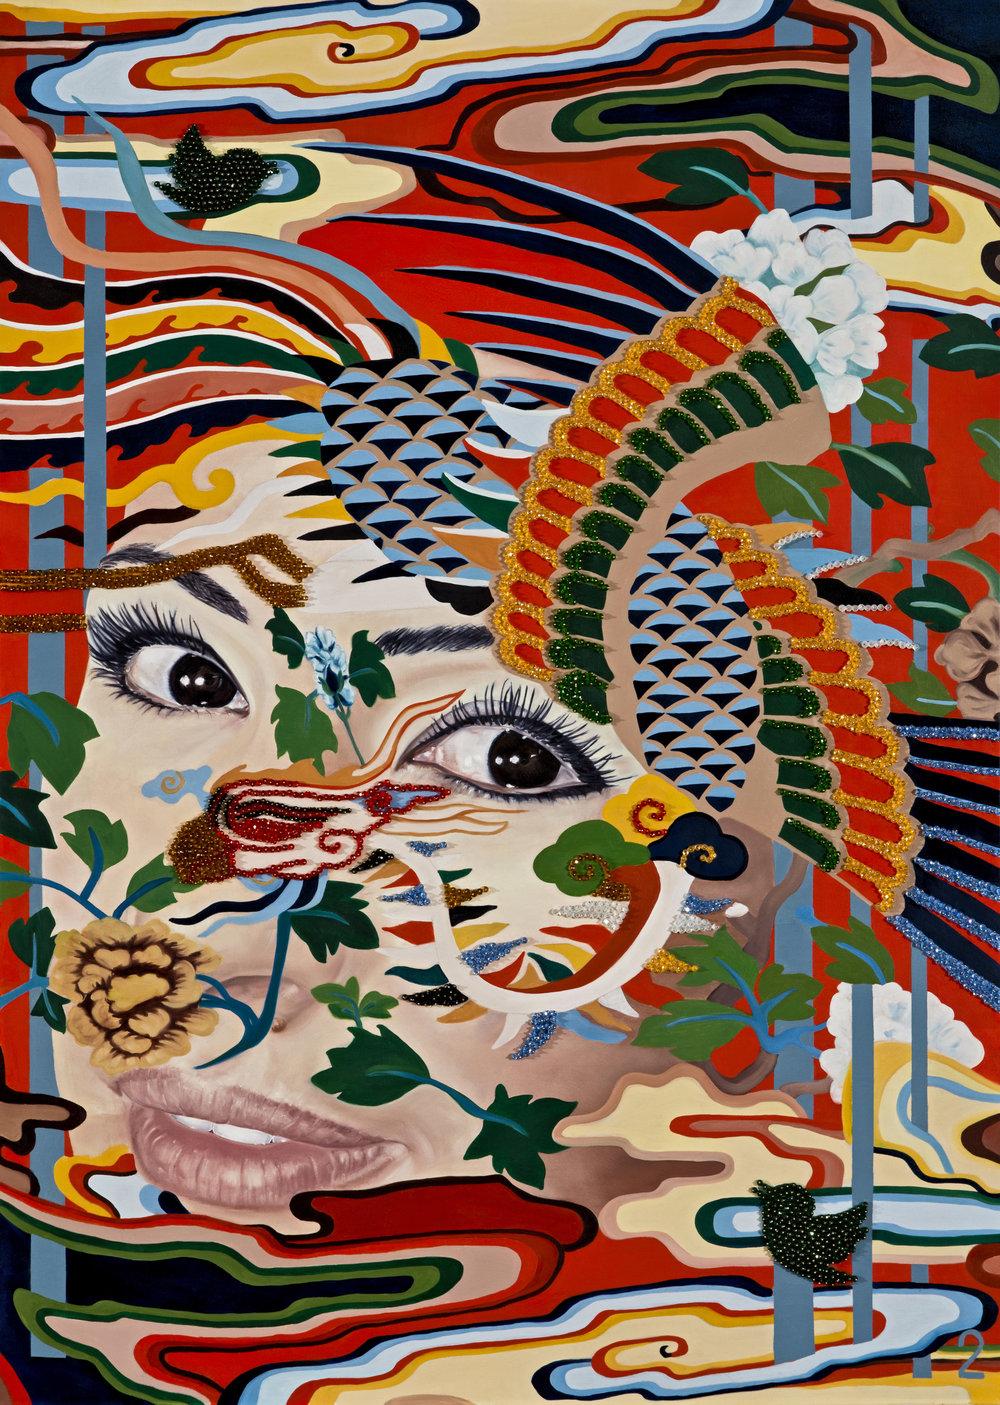 Garden of Armina, Phoenix 2018 oil and swarovski beads on canvas 170 x 120 cm